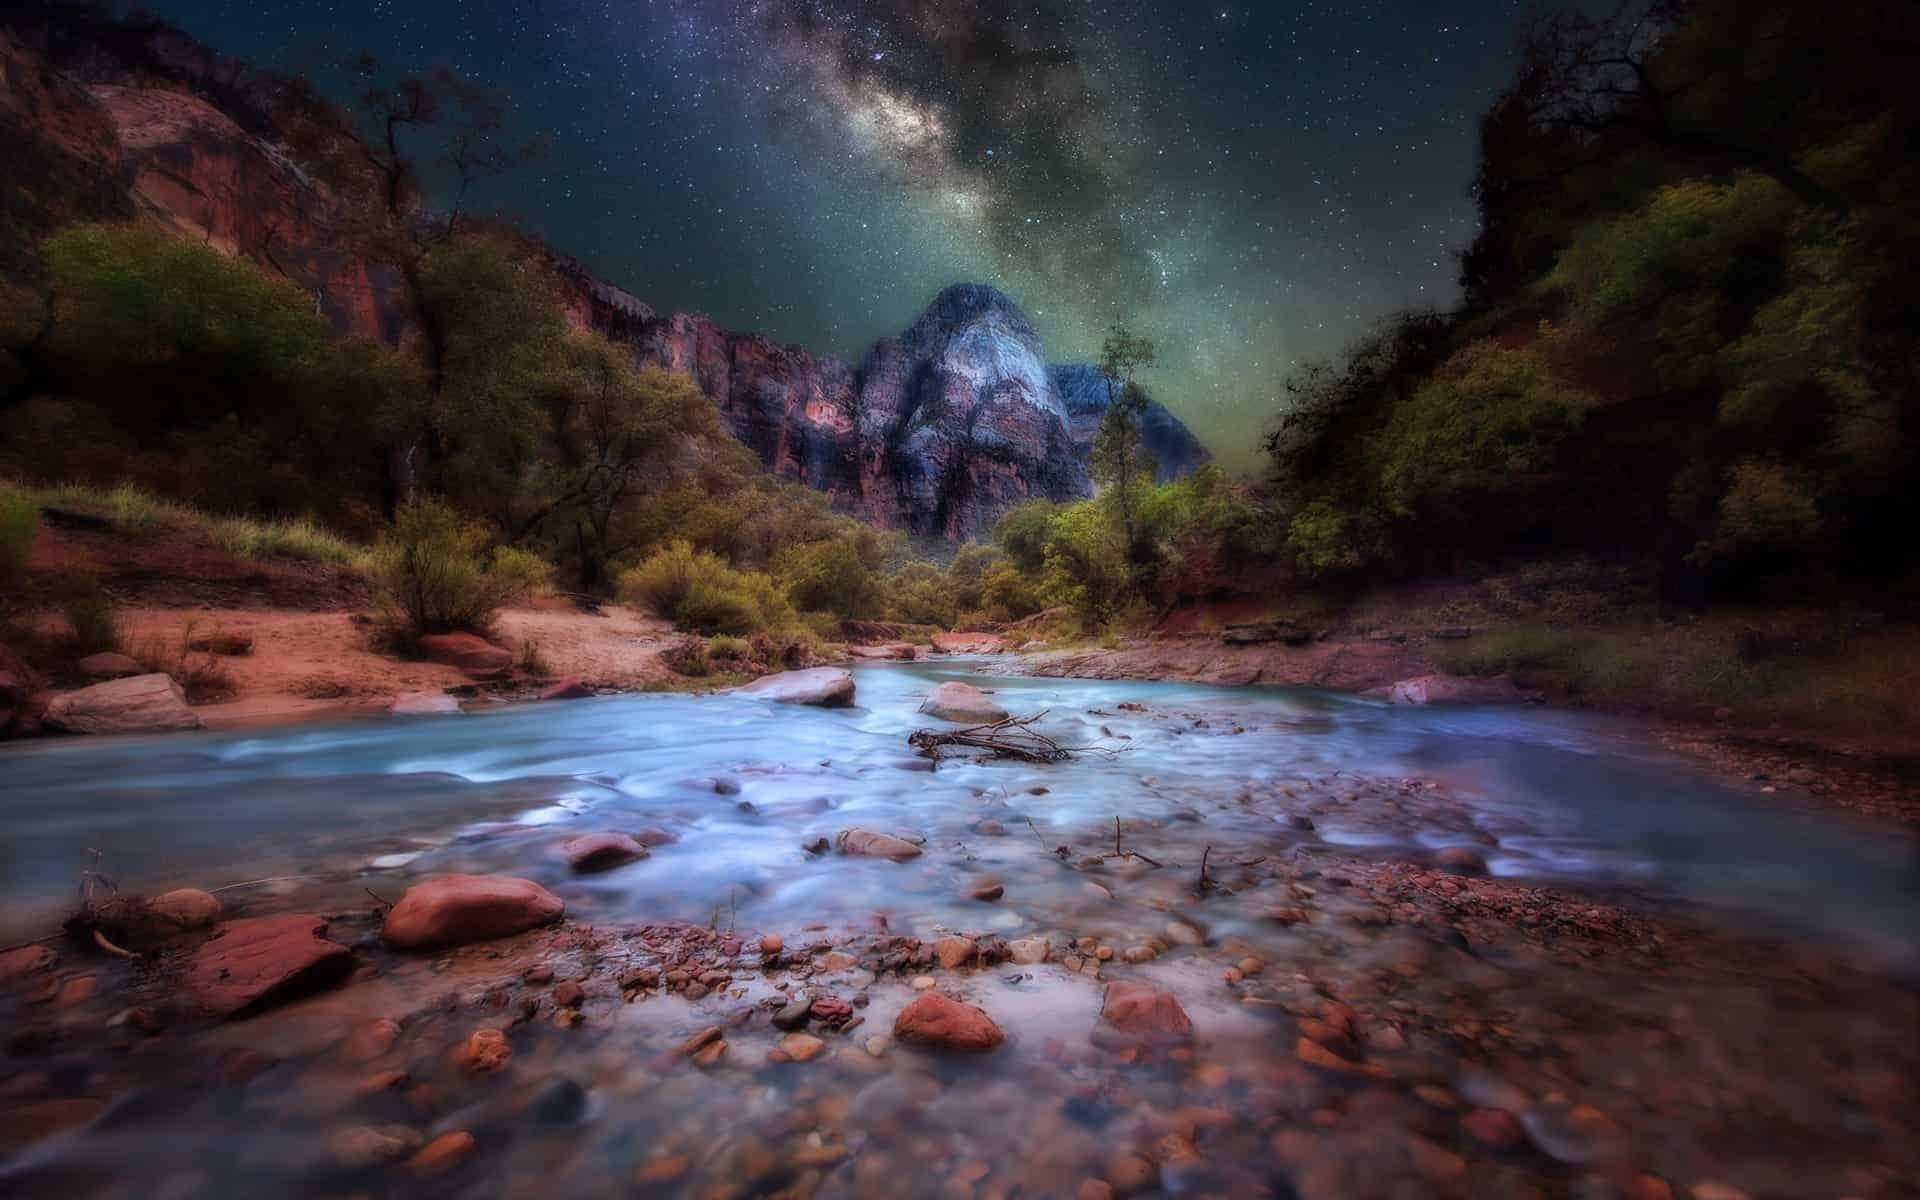 Zion-National-Park-mountains-dark-sky